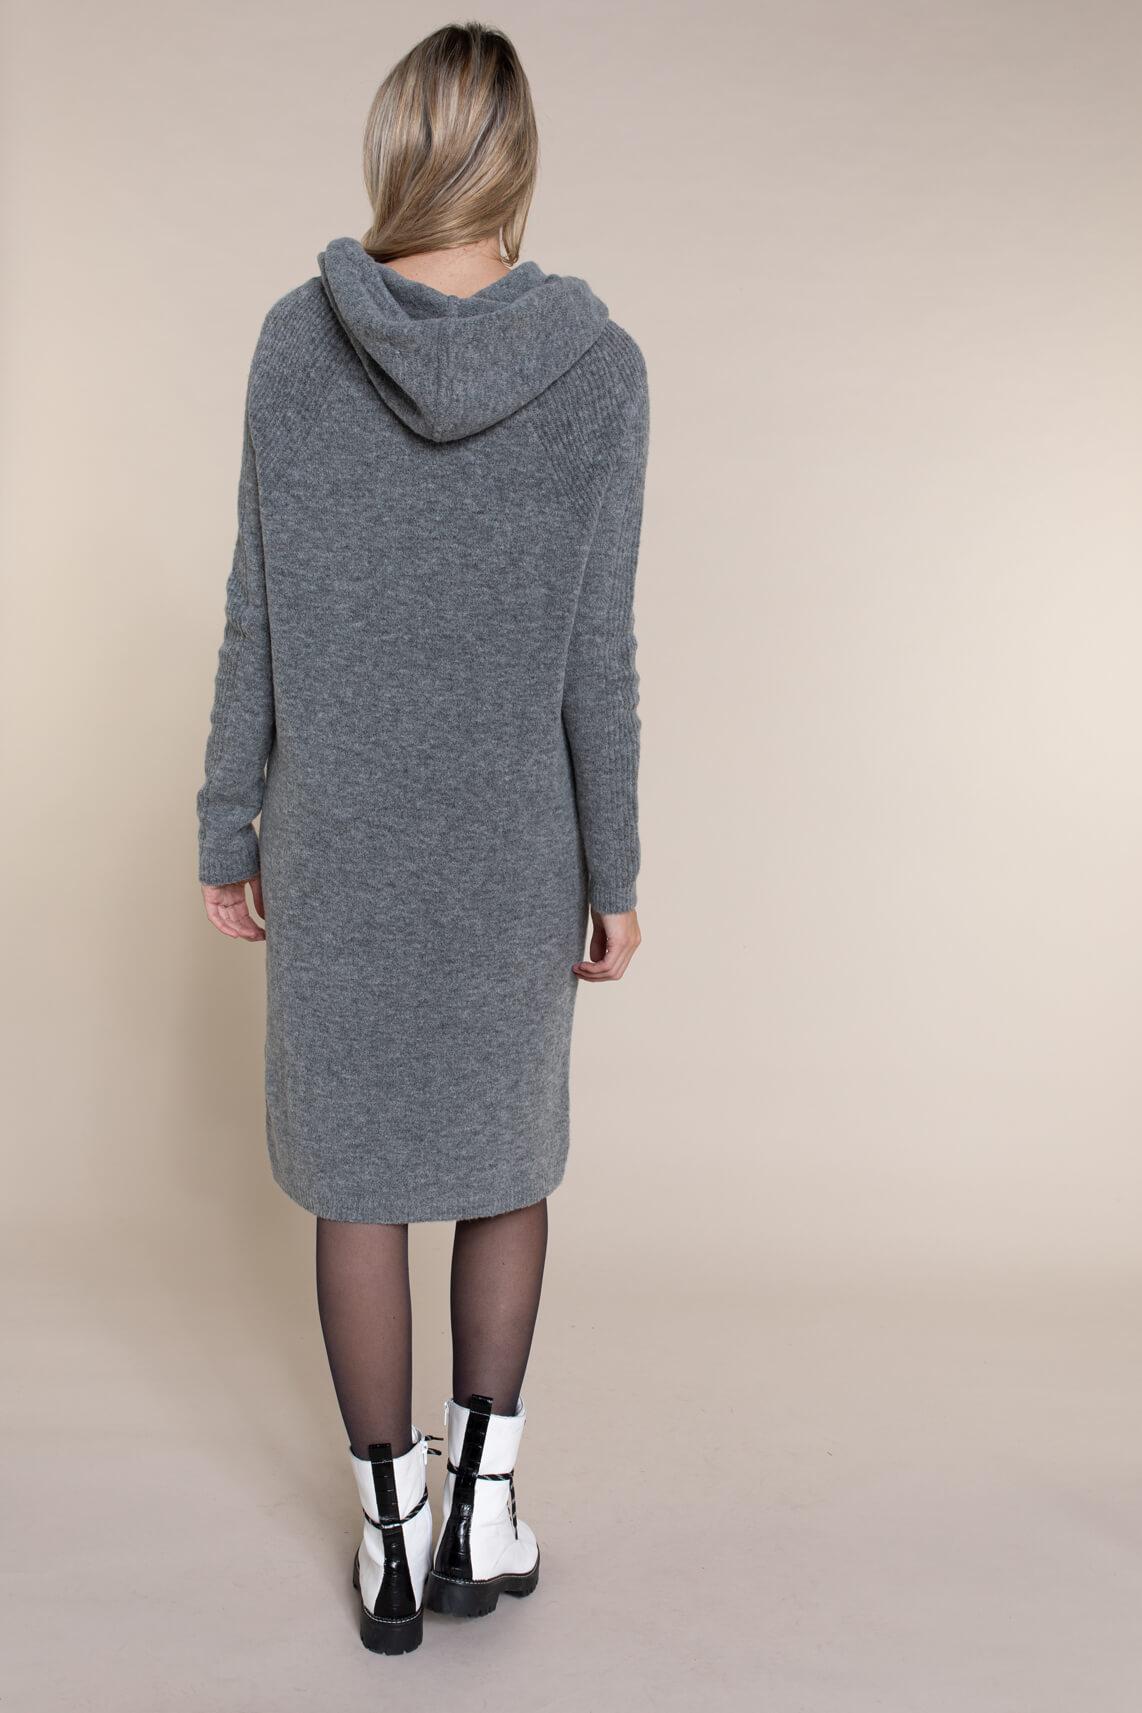 Moscow Dames Jekatarina gebreide jurk Grijs